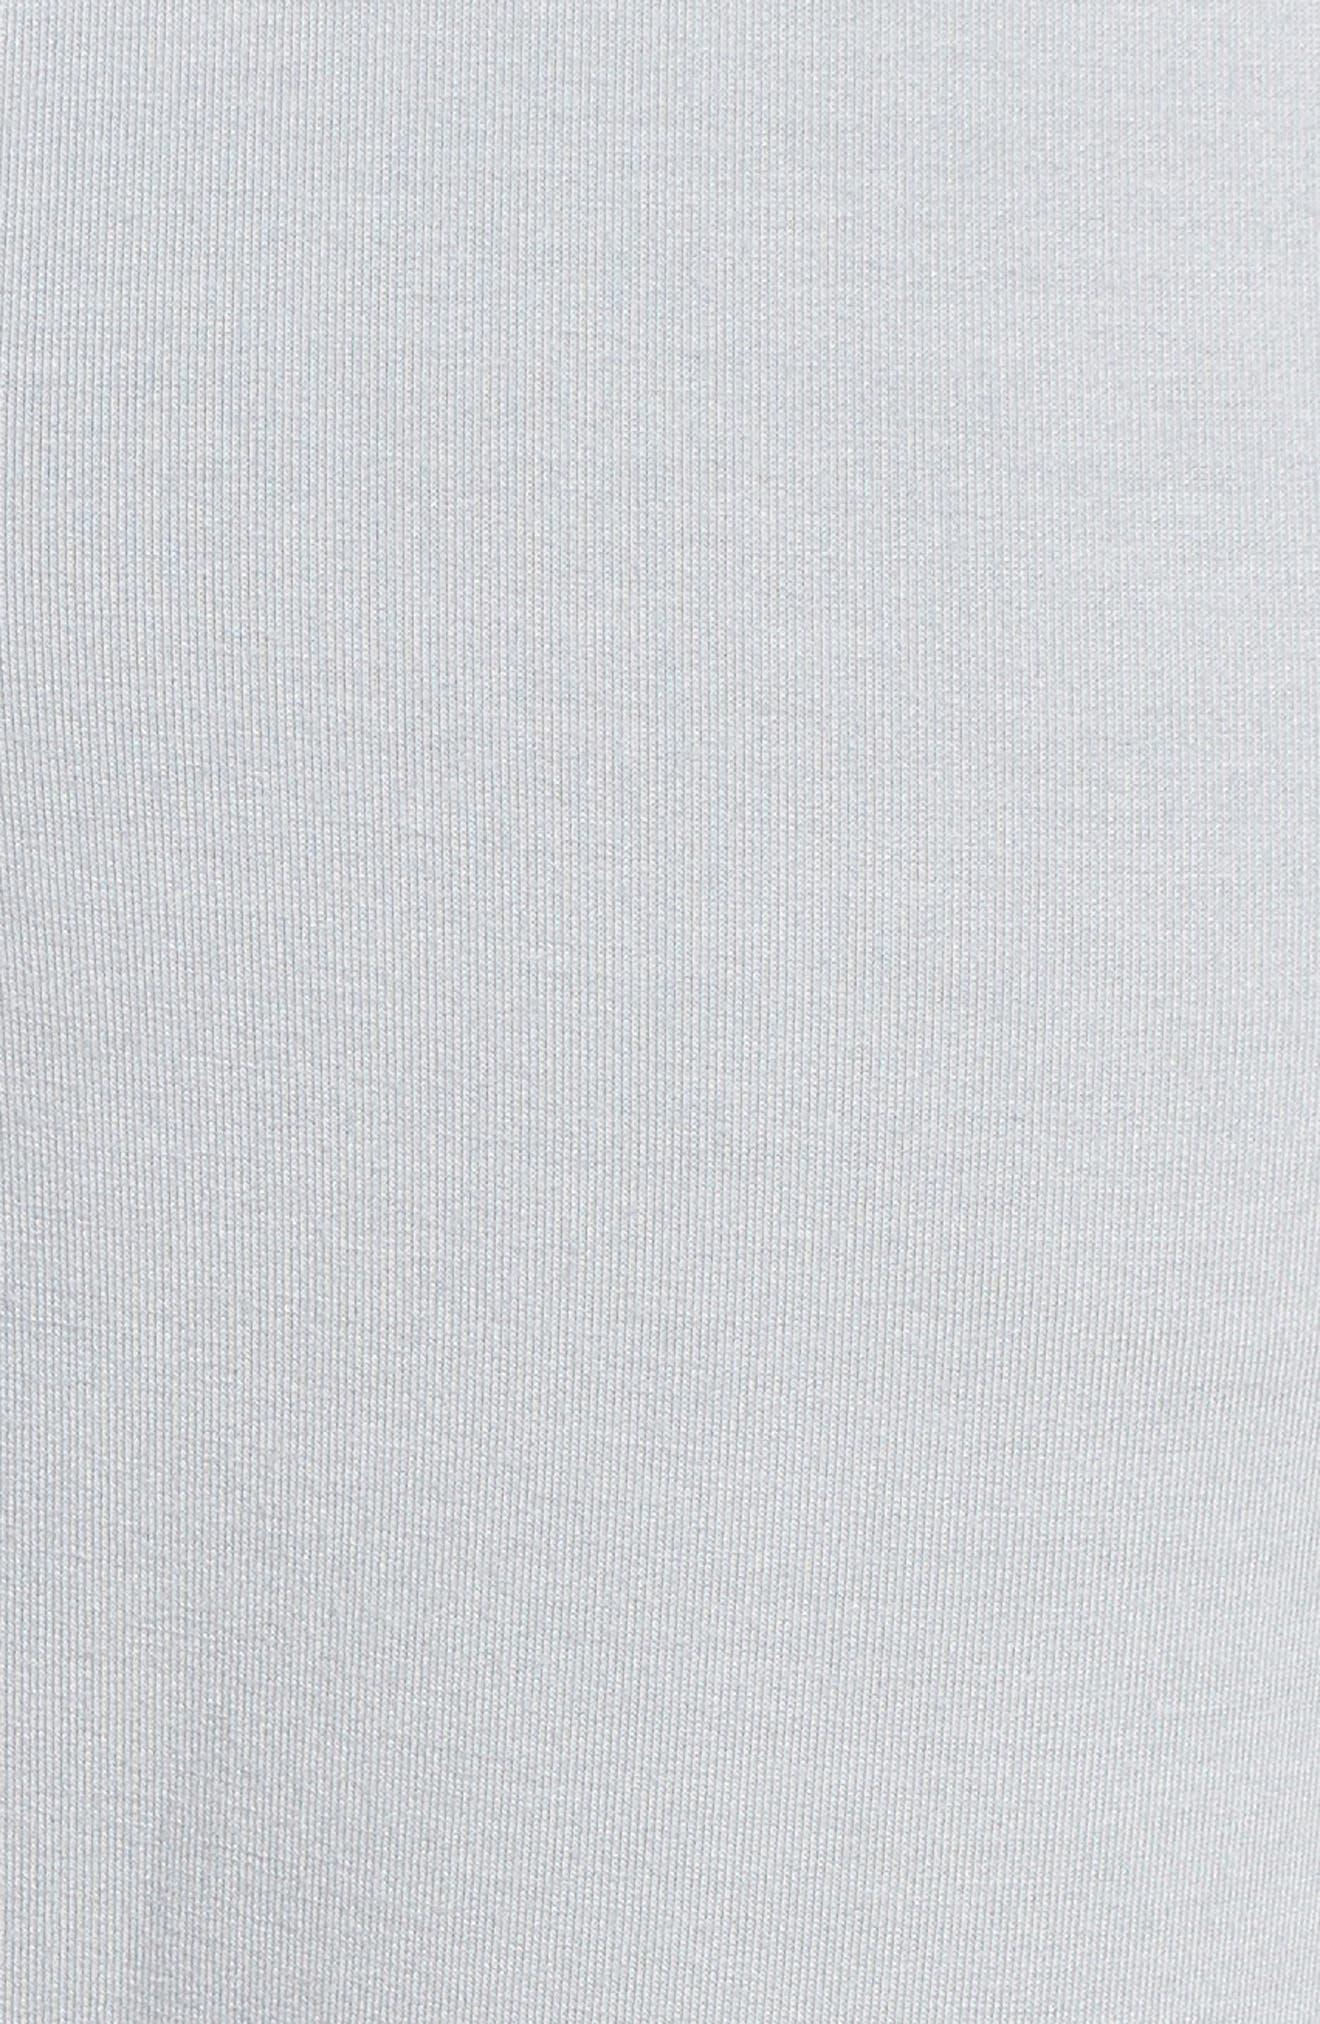 Gathered Jogger Pants,                             Alternate thumbnail 6, color,                             030